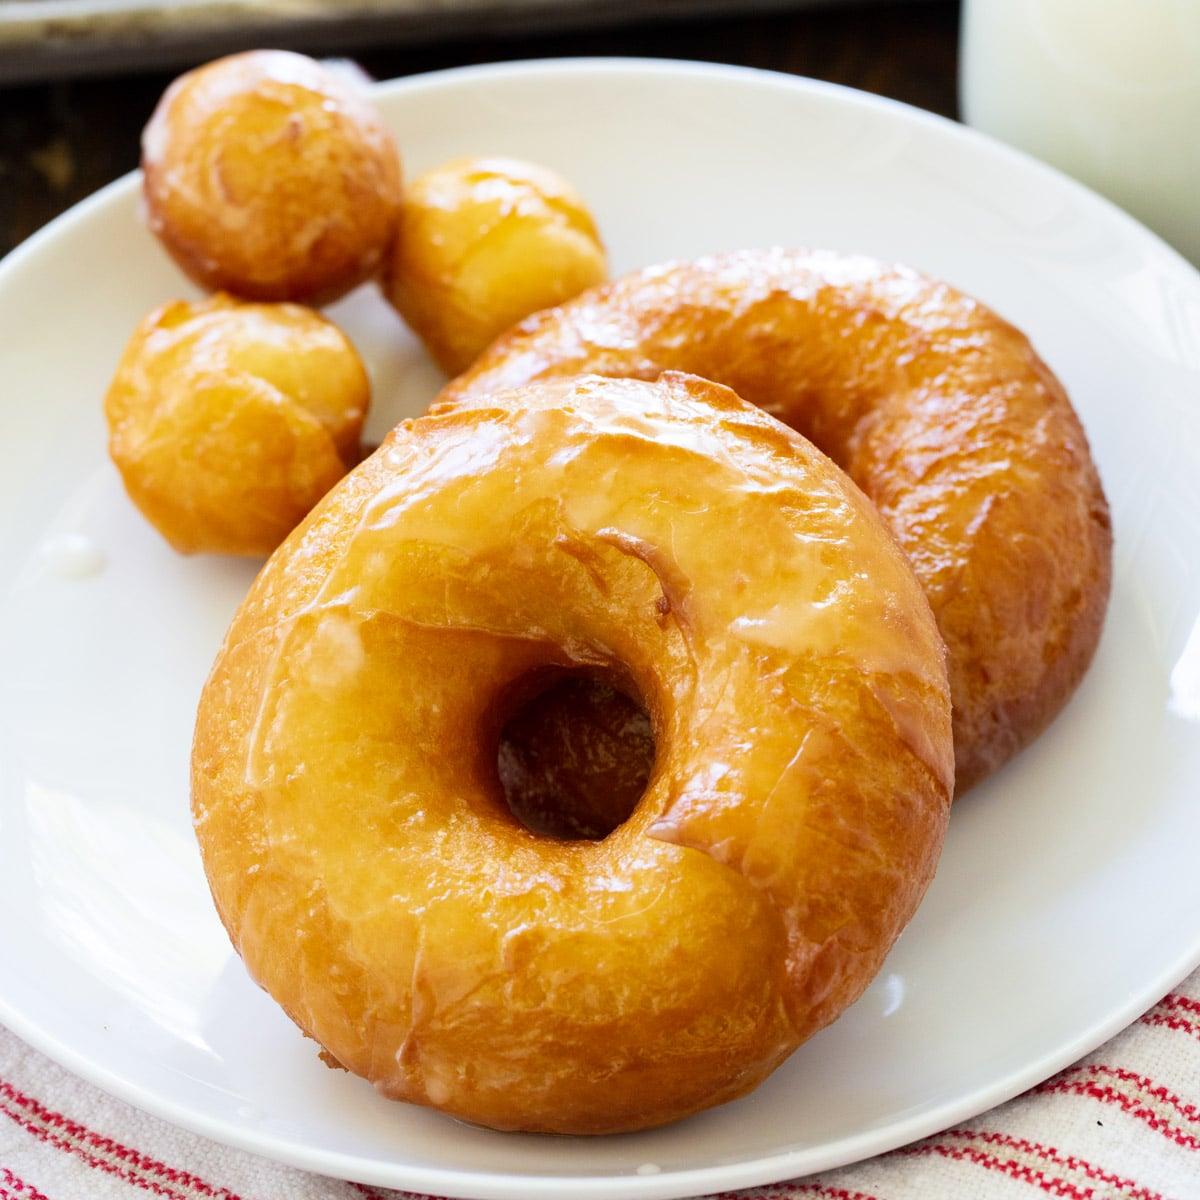 Two Copycat Krispy Kreme Doughnuts on a plate.